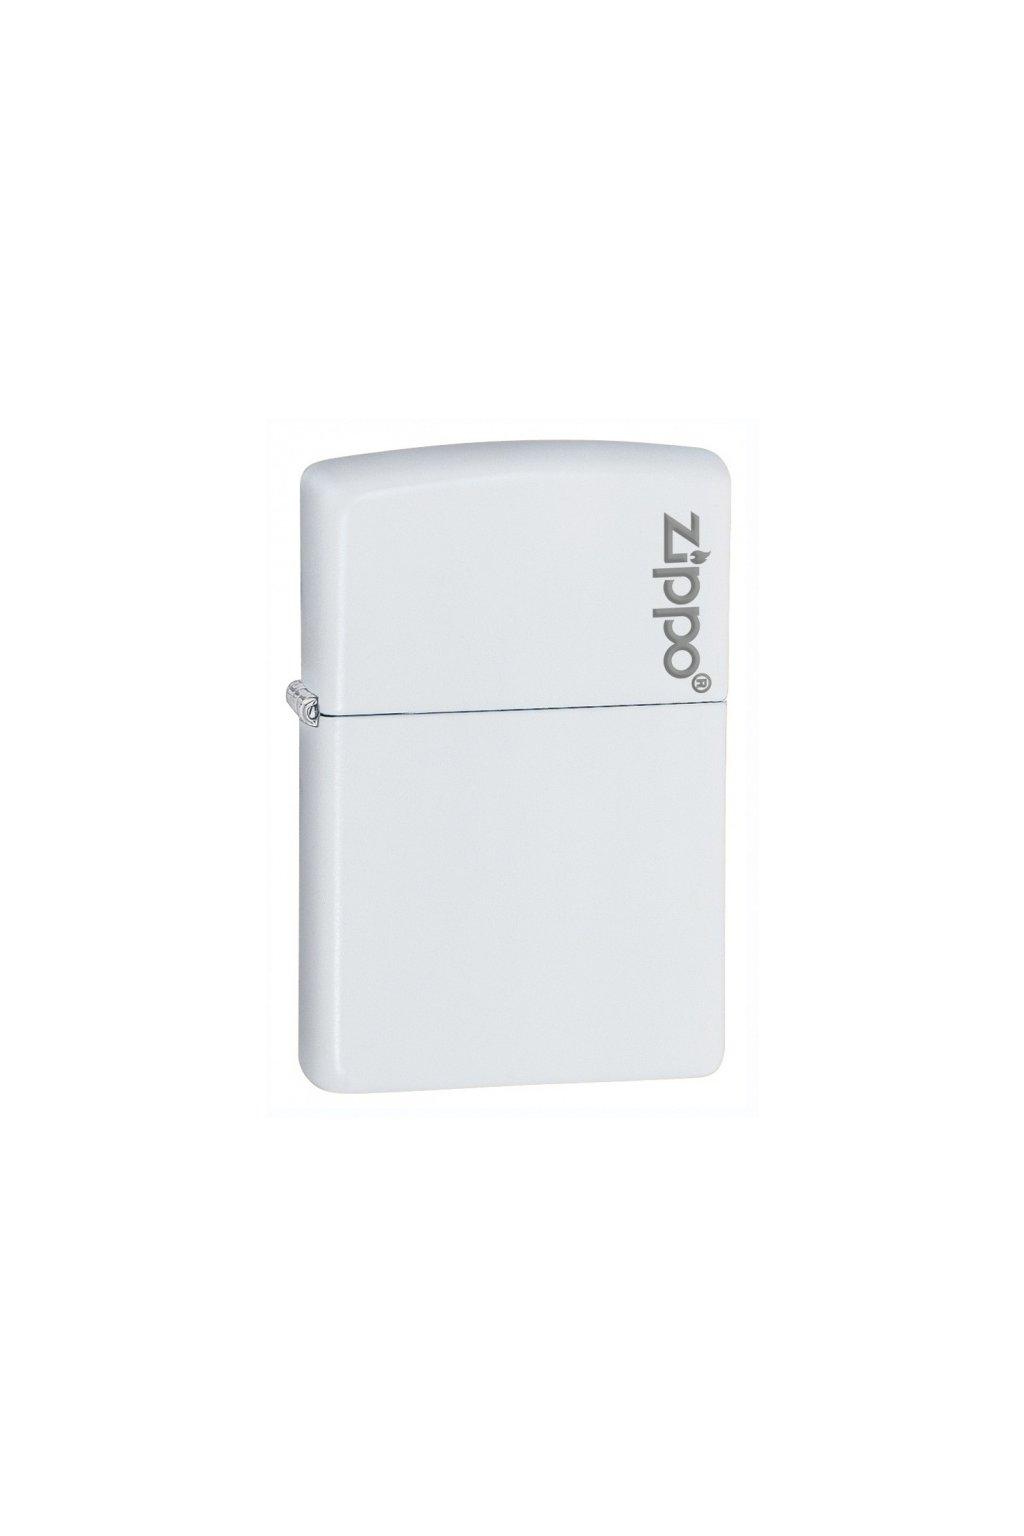 93794 zippo zapalovac 26417 white matte zl